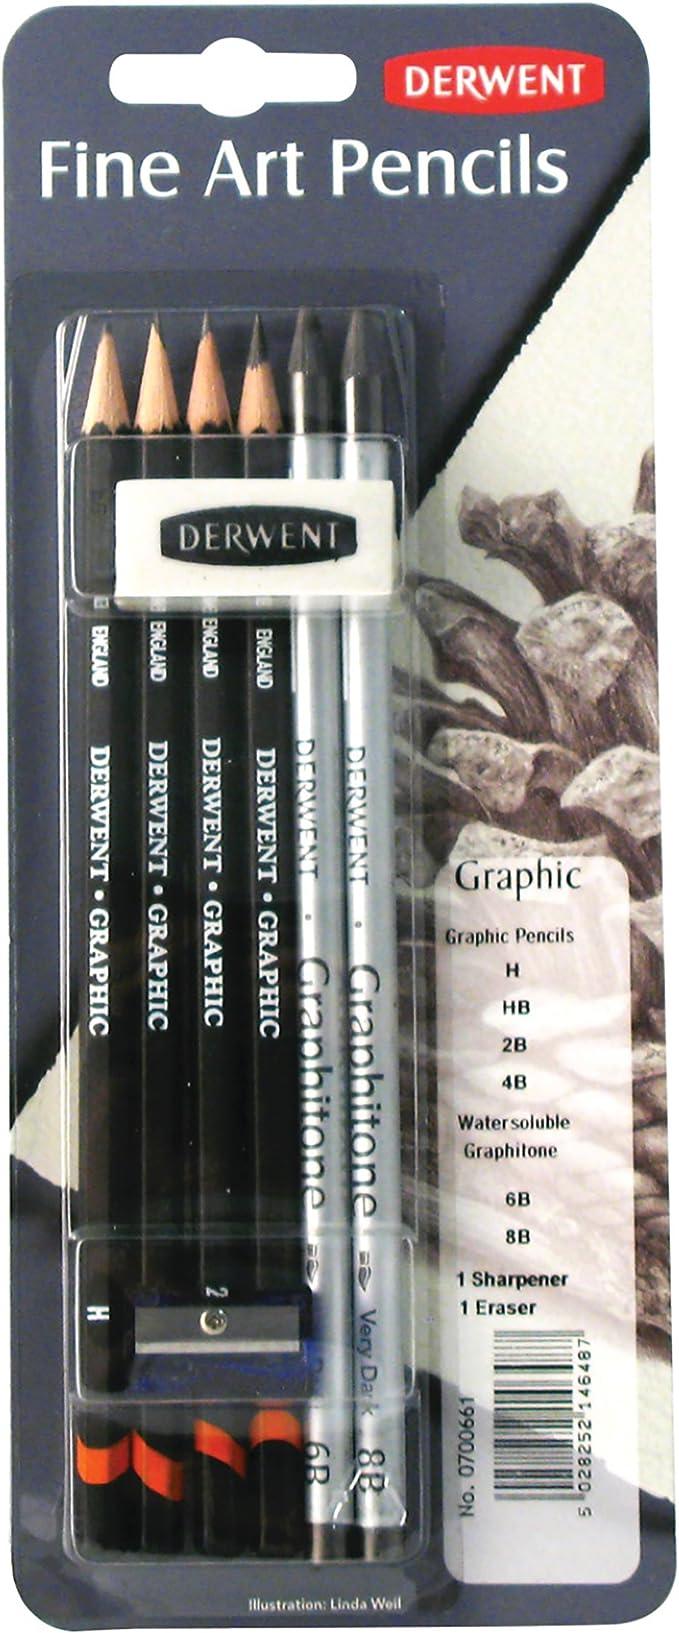 Professional Derwent Graphic Graphite Drawing Pencils Set of 6 with Sharpener